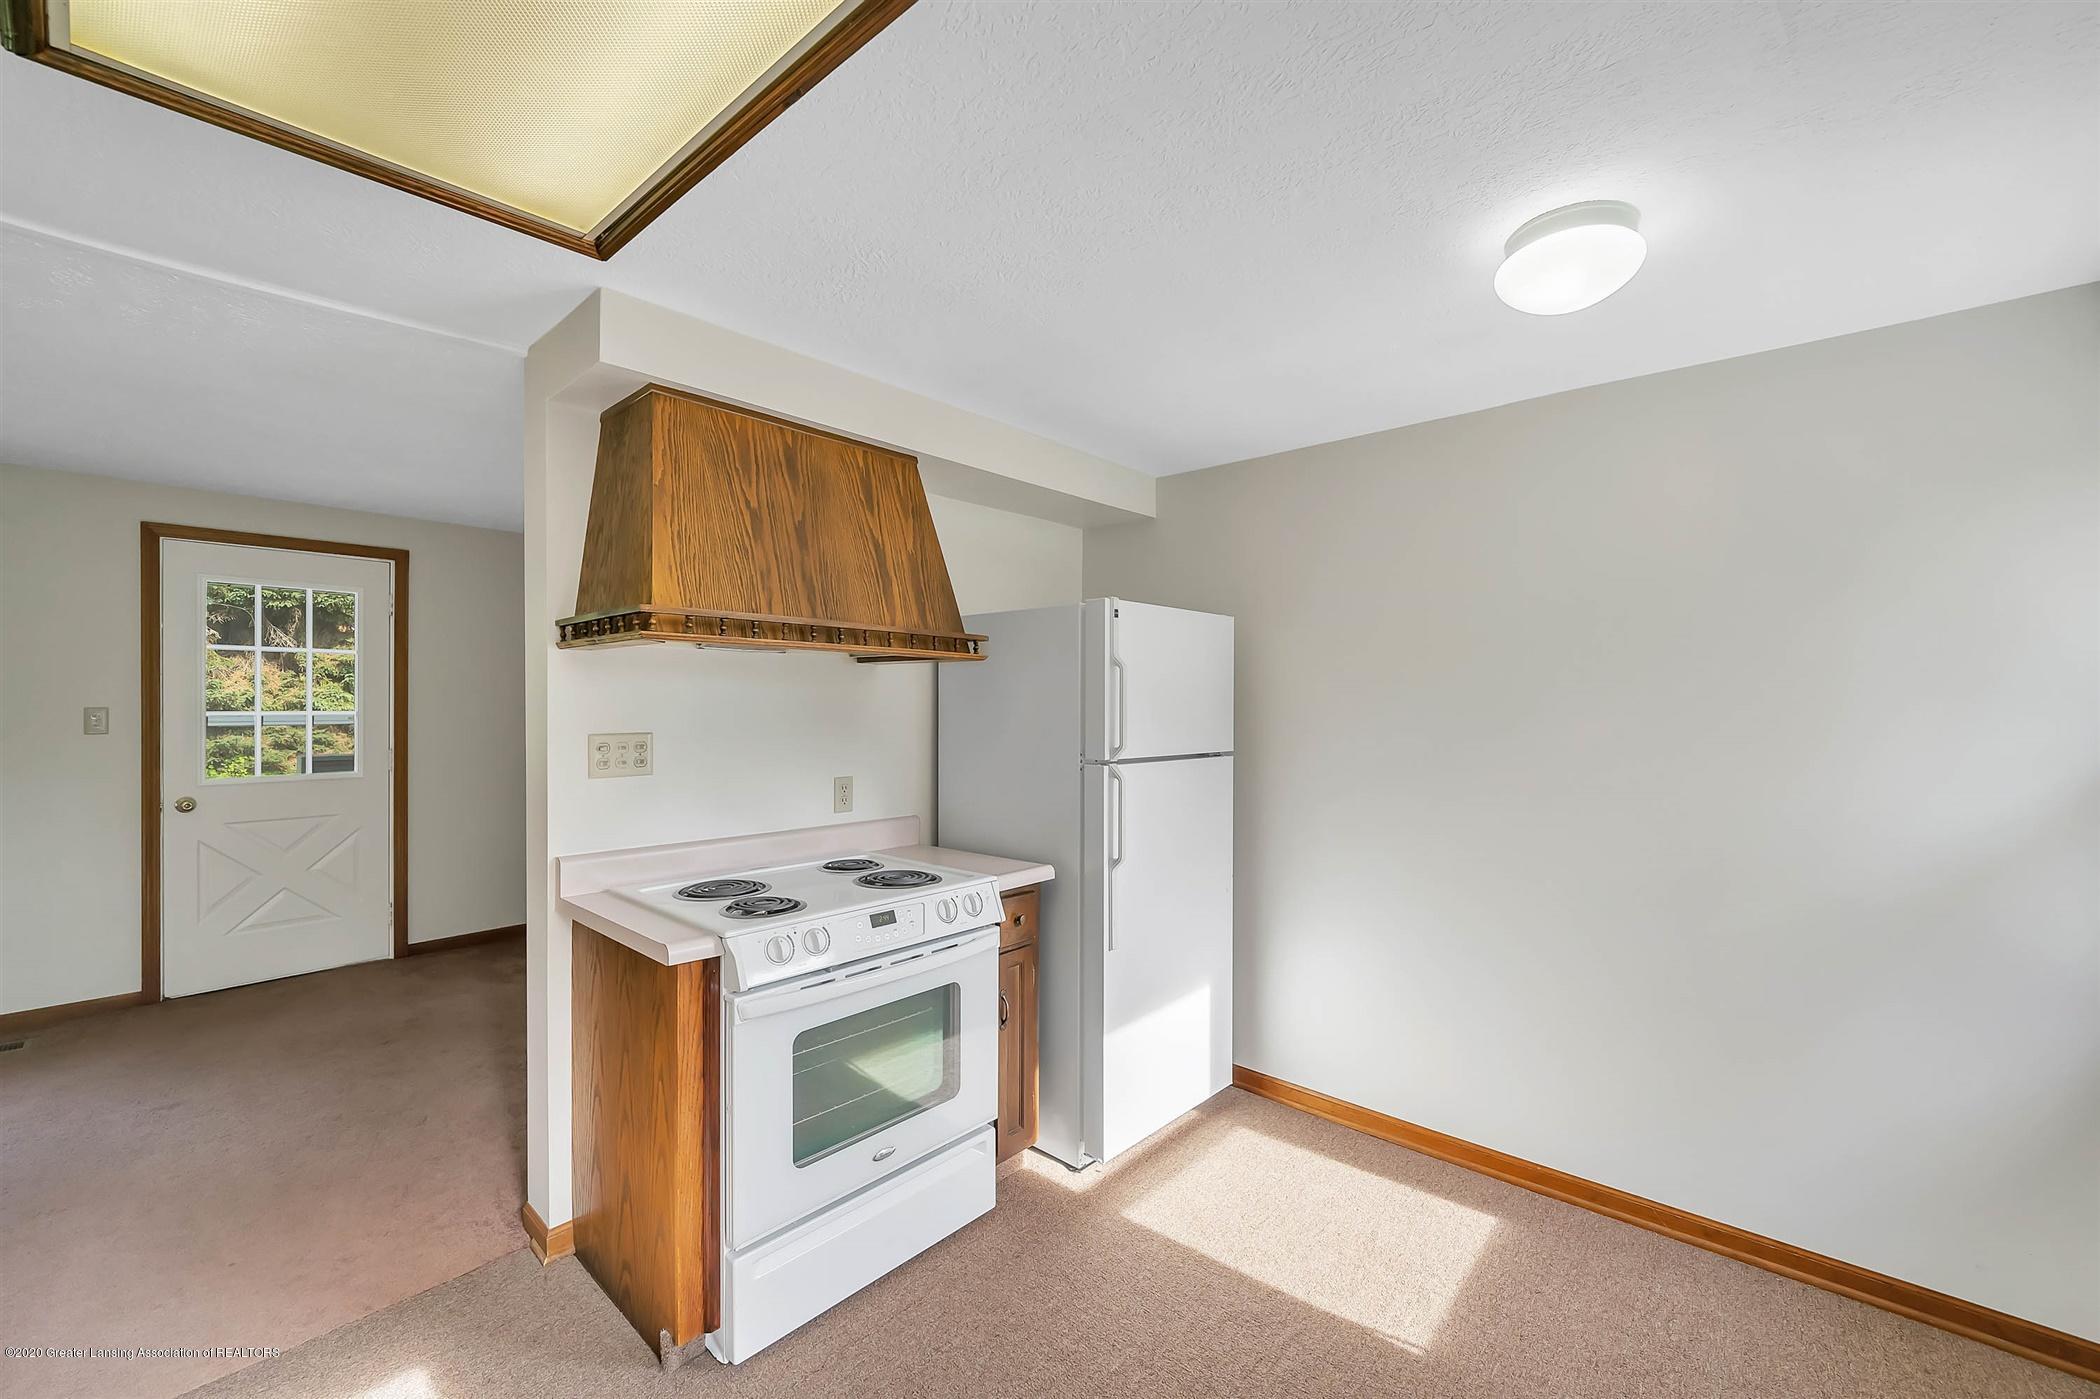 6750 W Lovejoy Rd - (25) 6756 Lovejoy Kitchen - 25